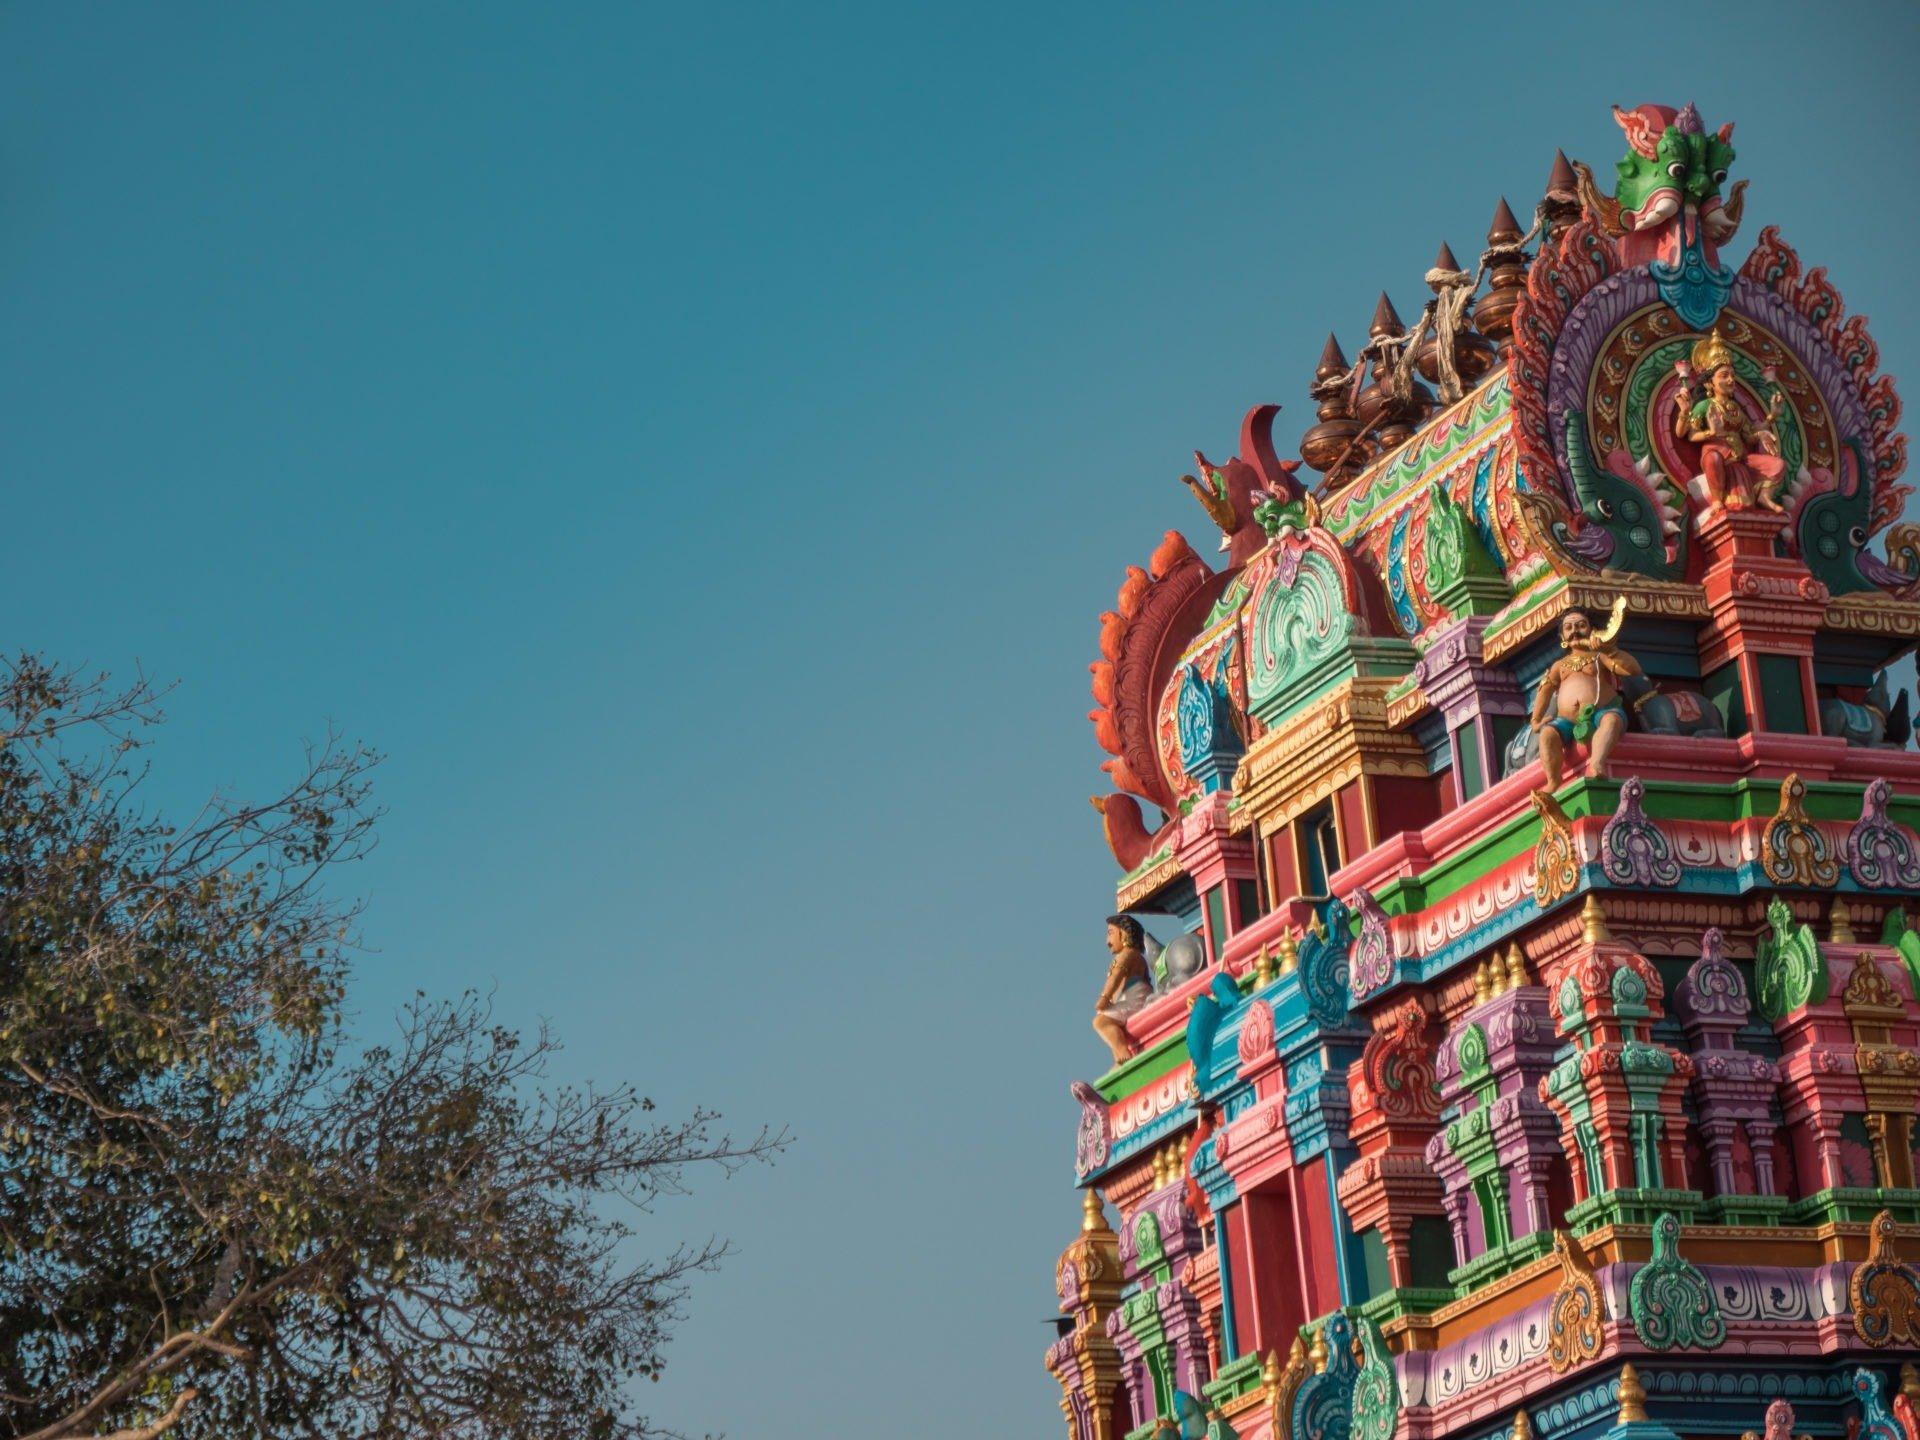 jaffna temple 3 - Les globe blogueurs - blog voyage nature